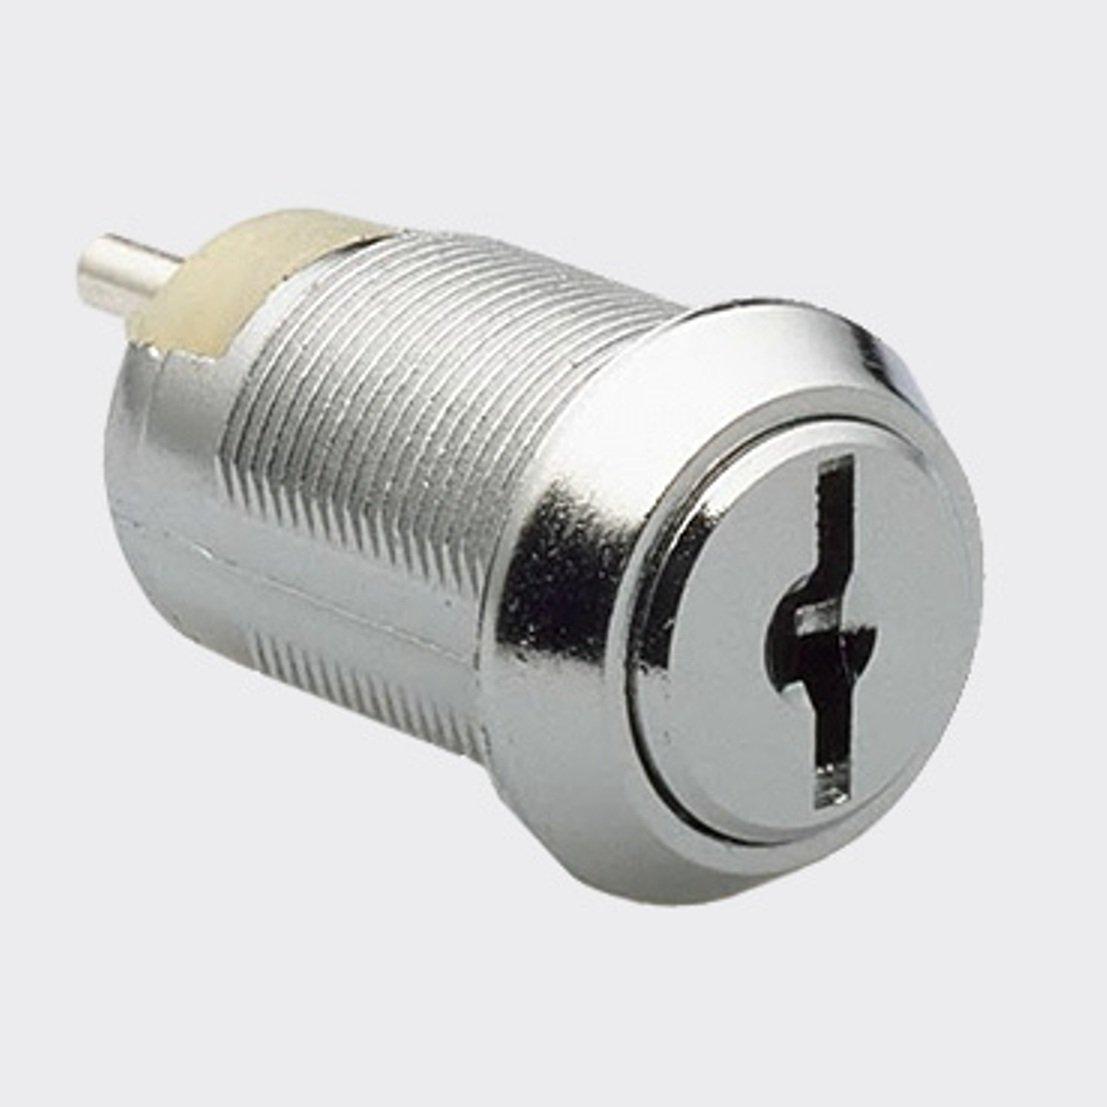 2-Position Key Switch, Keyed Alike, Key Removable in Off Position, 2 Keys, nut, Bezel